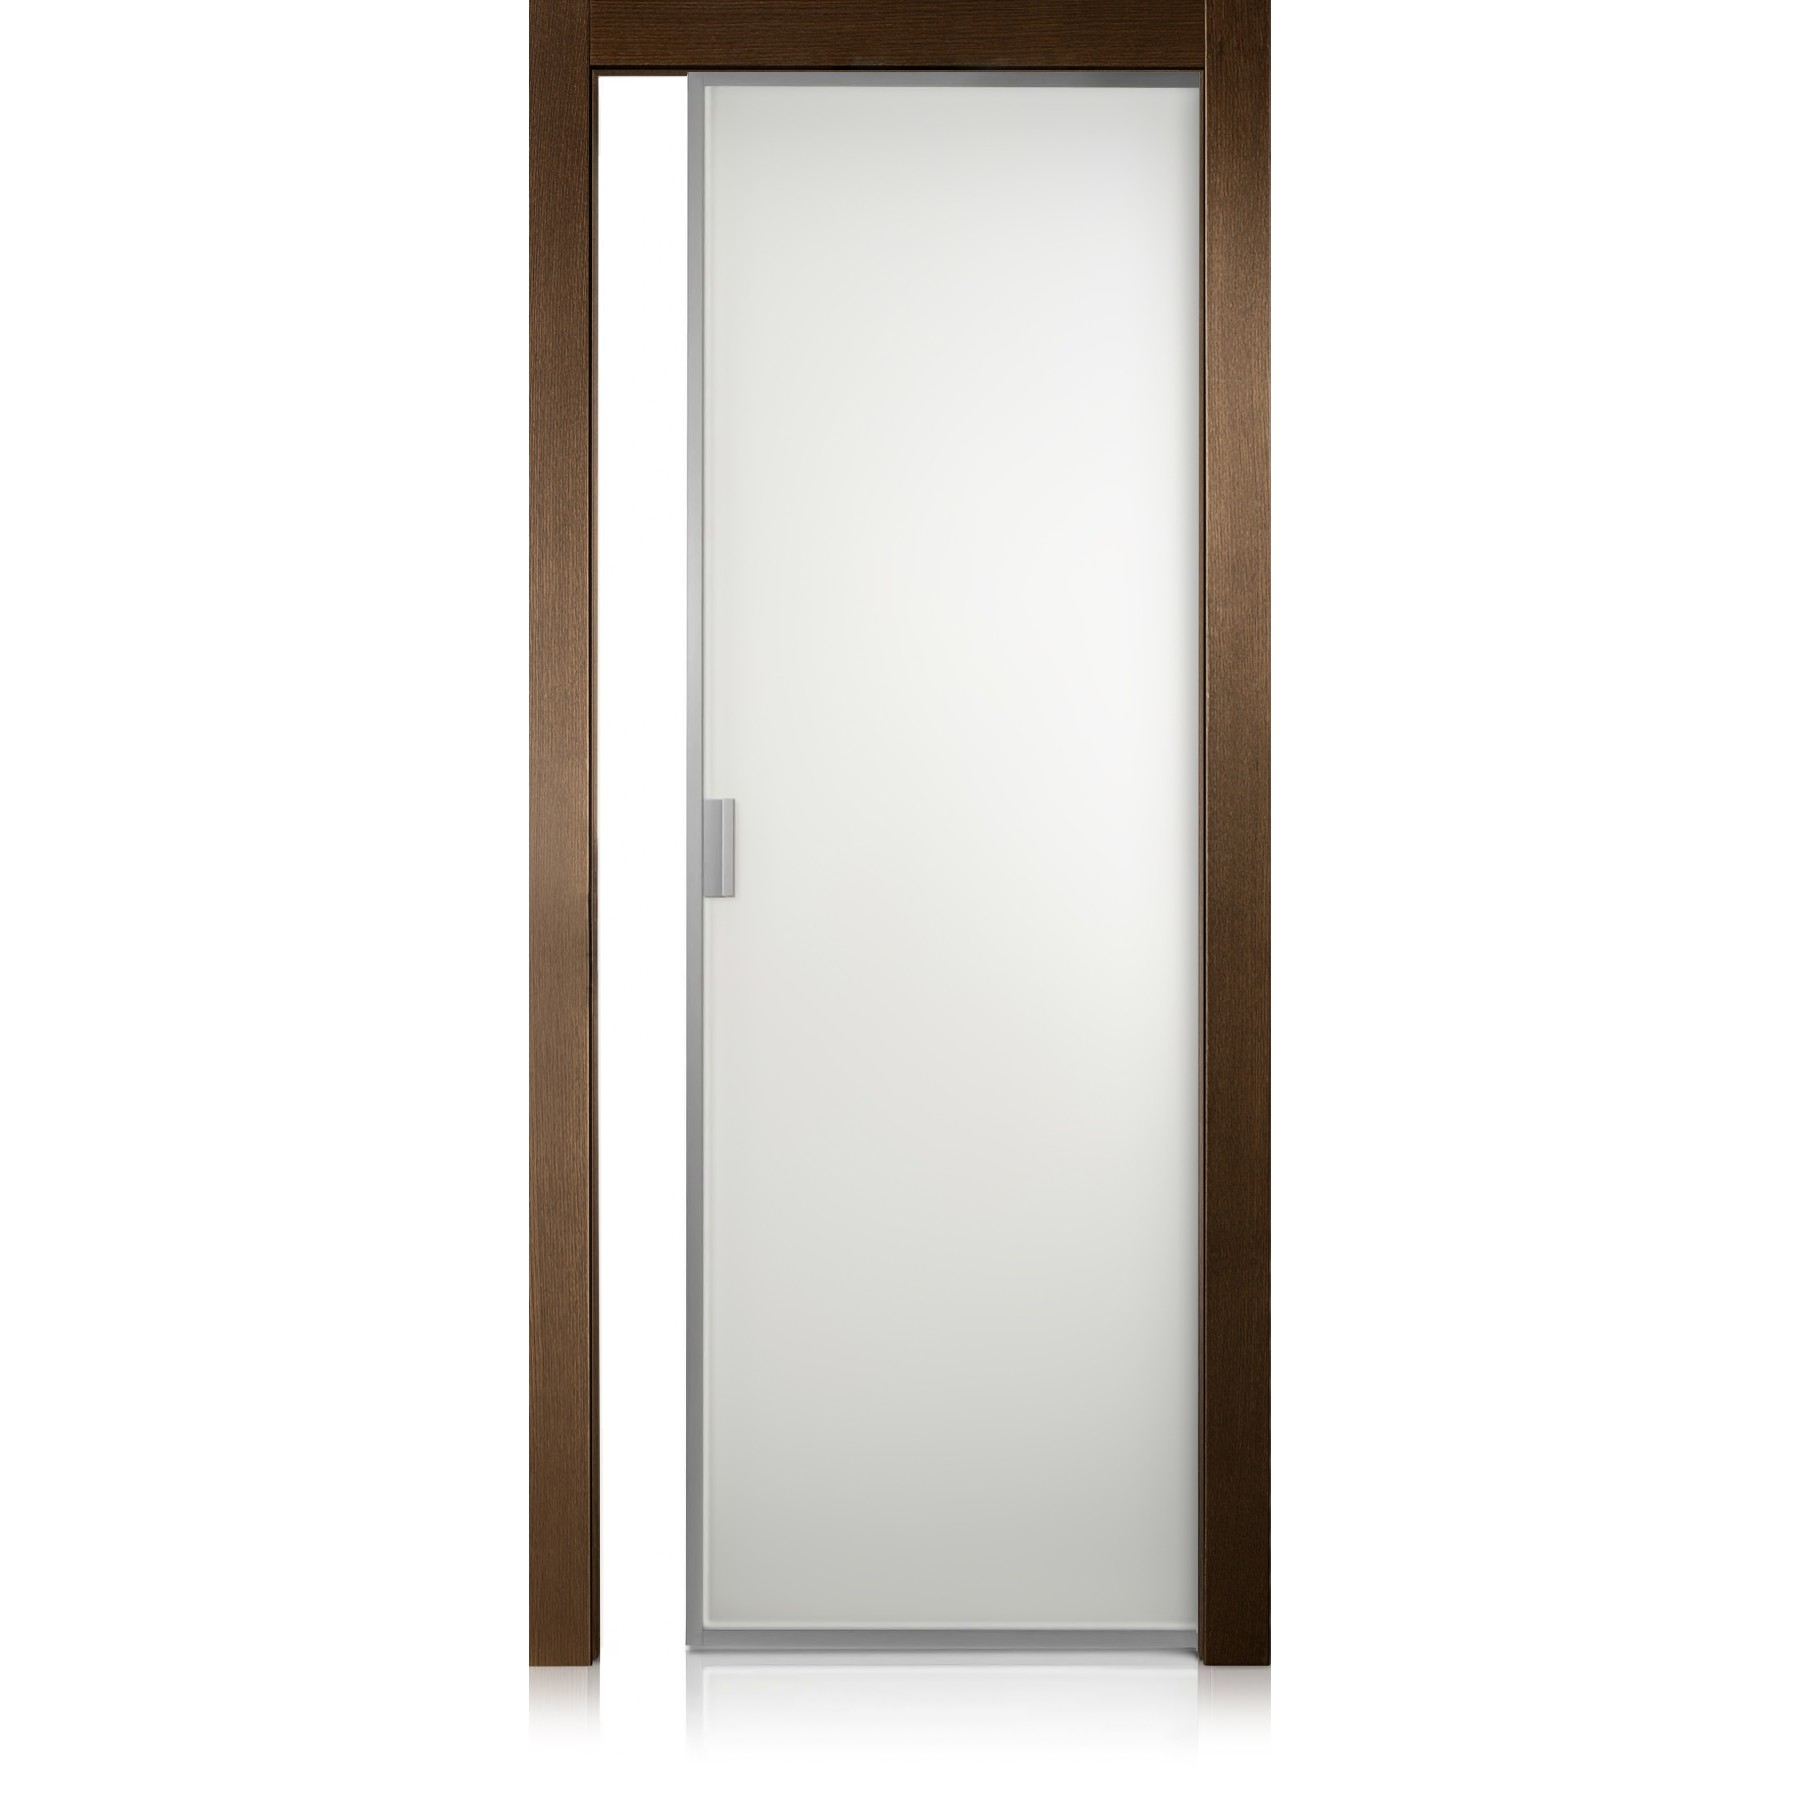 Cristal Frame ecorovere nut door